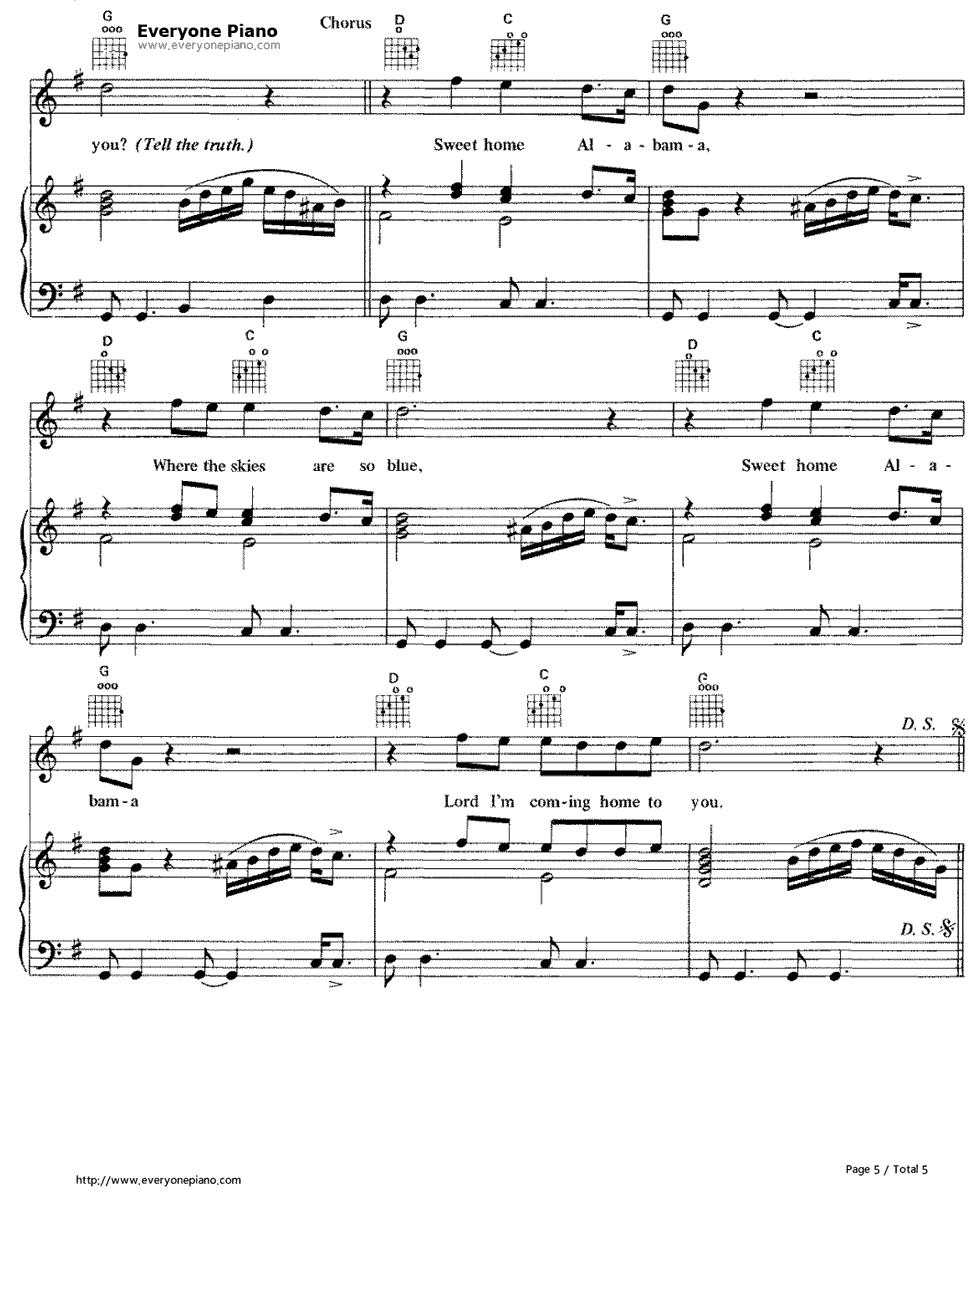 sweet transvestite sheet music pdf